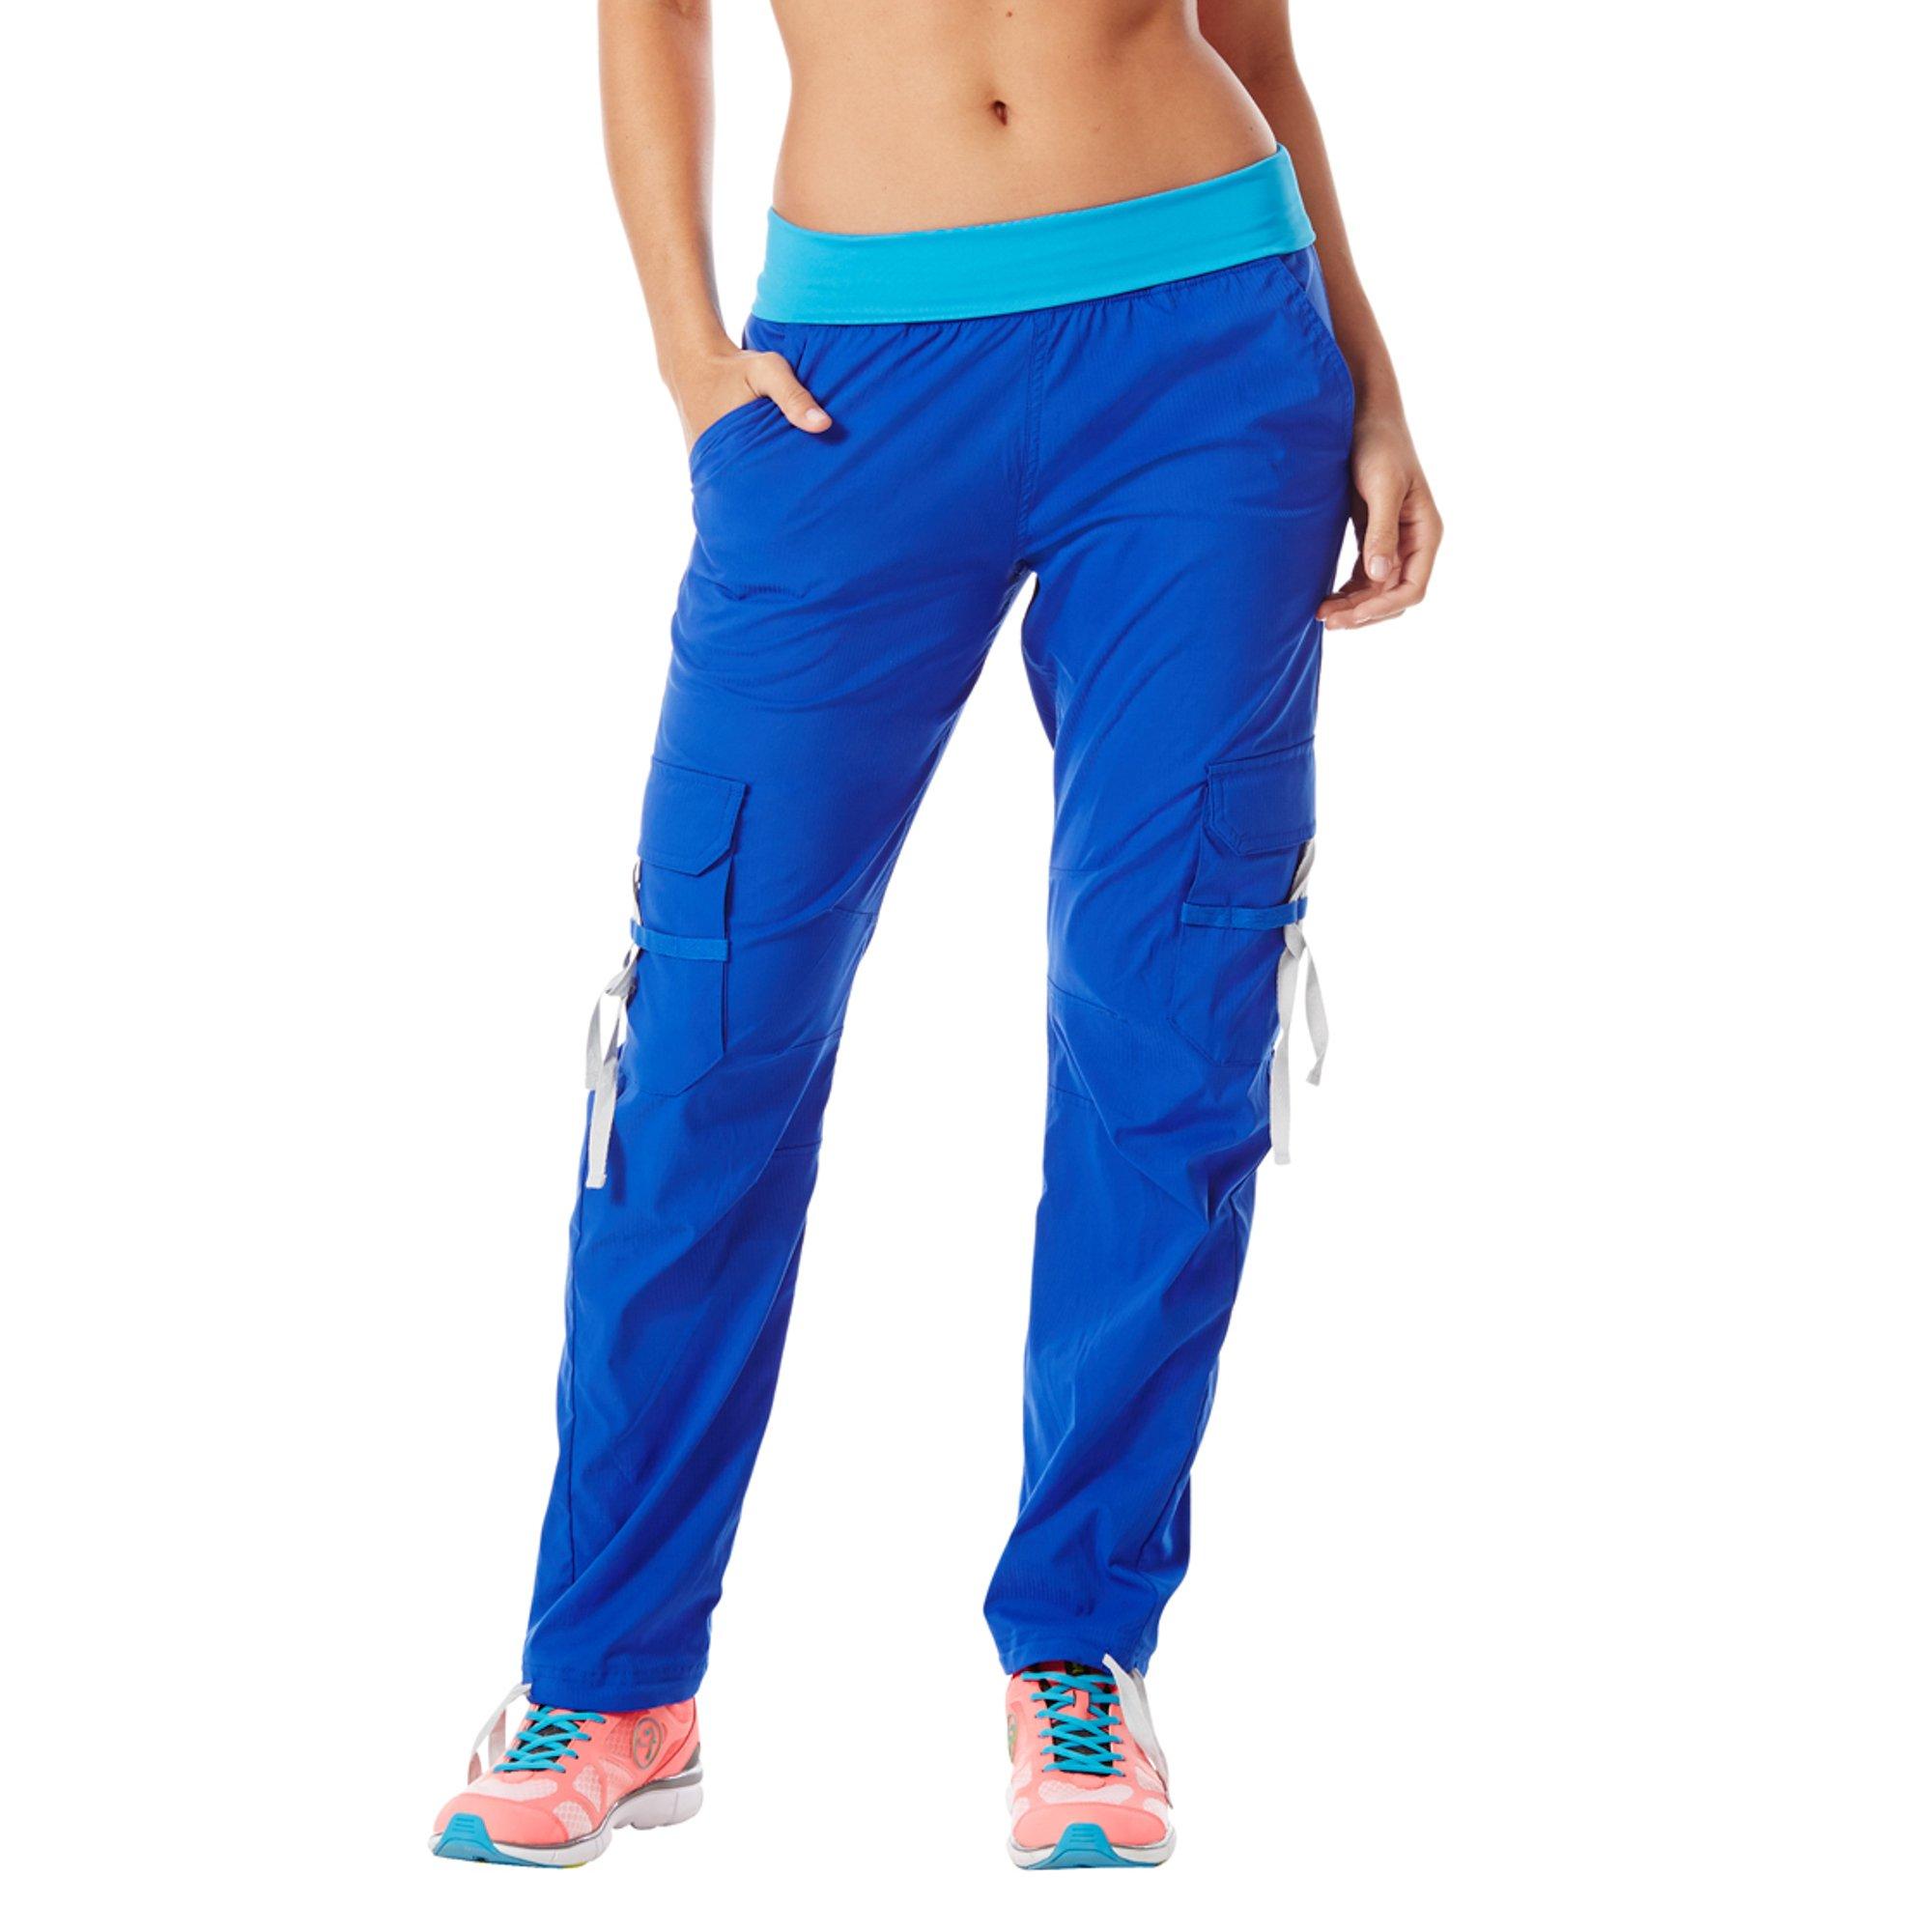 Zumba Women's Craveworthy Cargo Pants (XS, Surfs up Blue) by Zumba